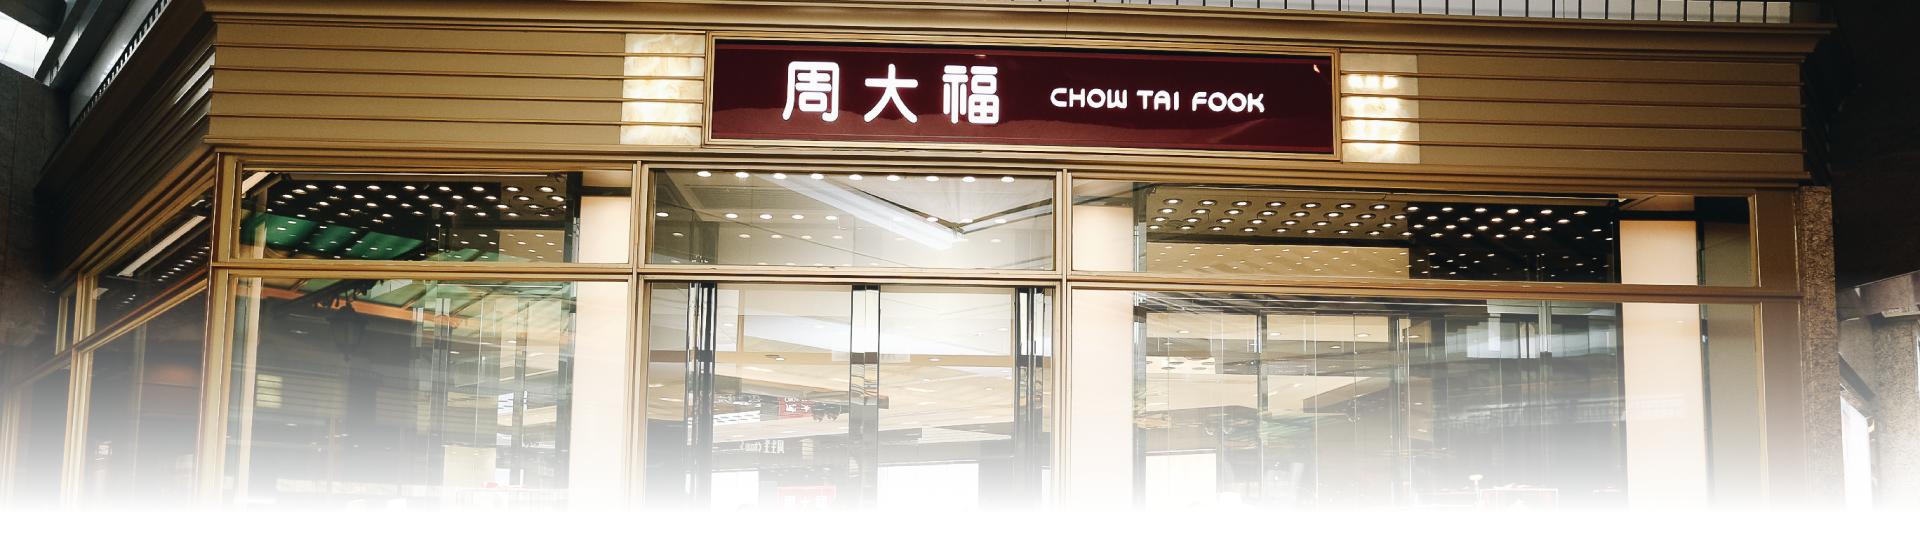 Chow Tai Fook-1